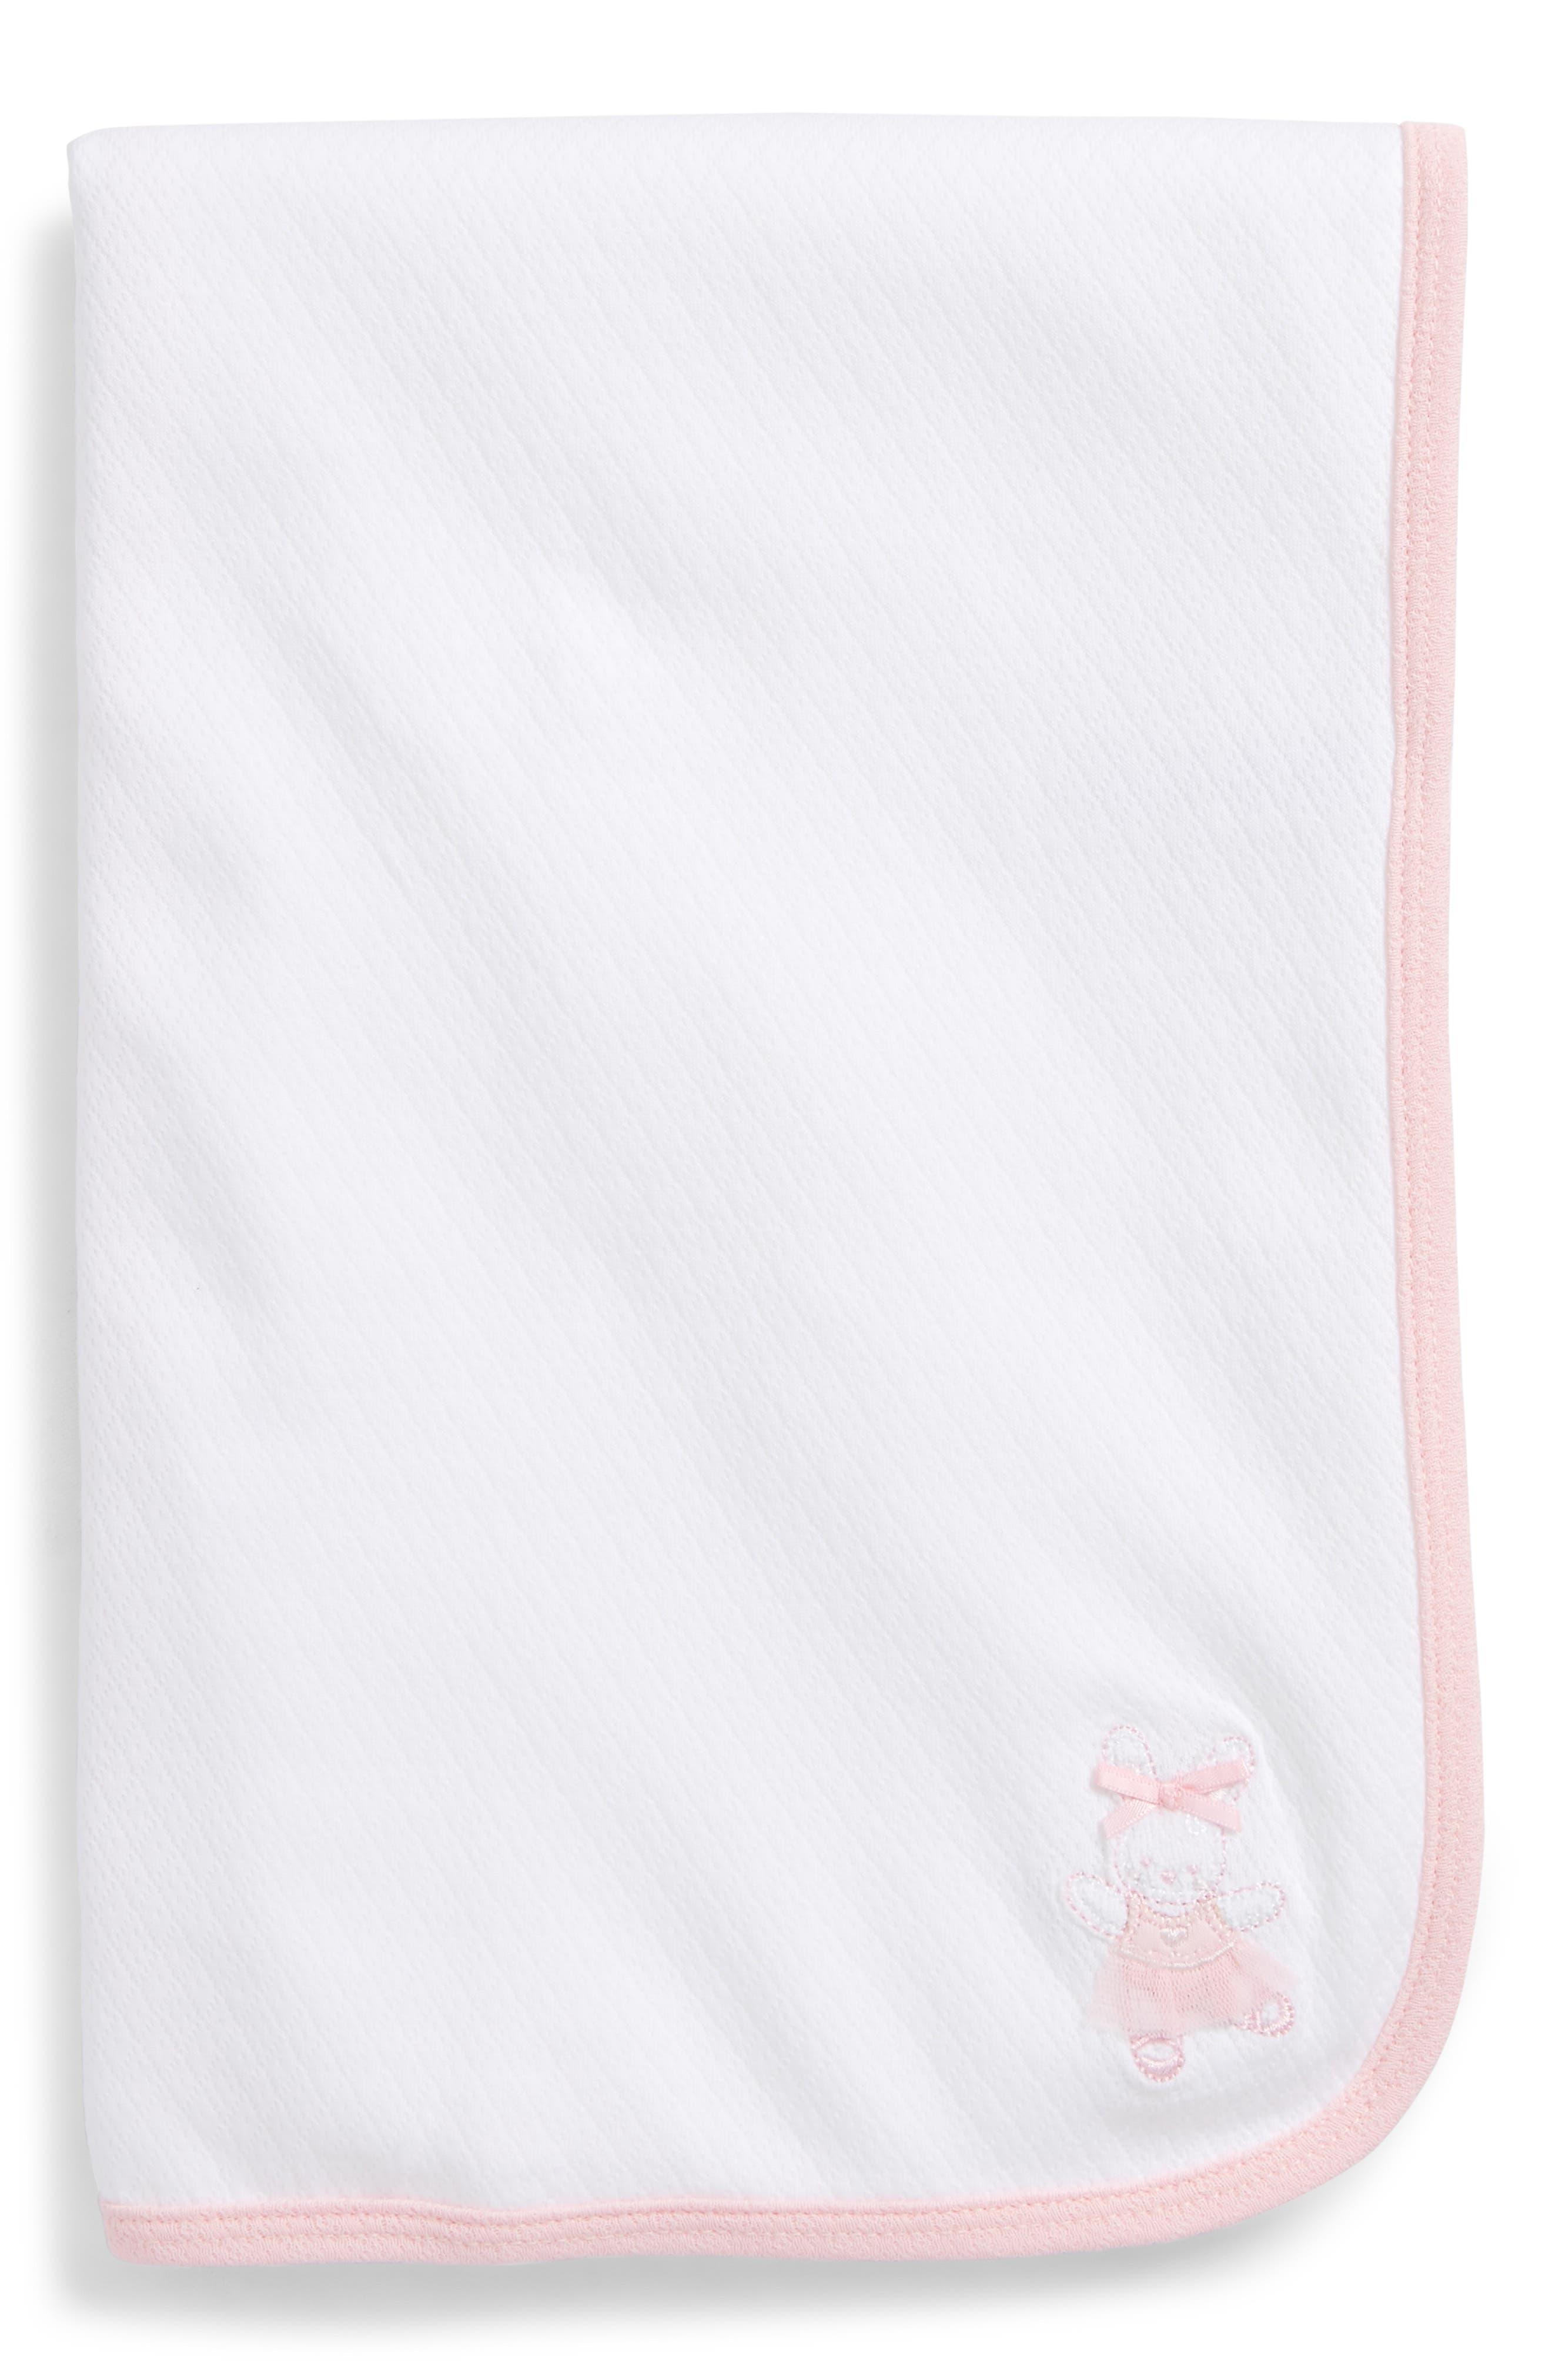 Alternate Image 1 Selected - Little Me Ballet Bunny Receiving Blanket (Baby) (Nordstrom Exclusive)